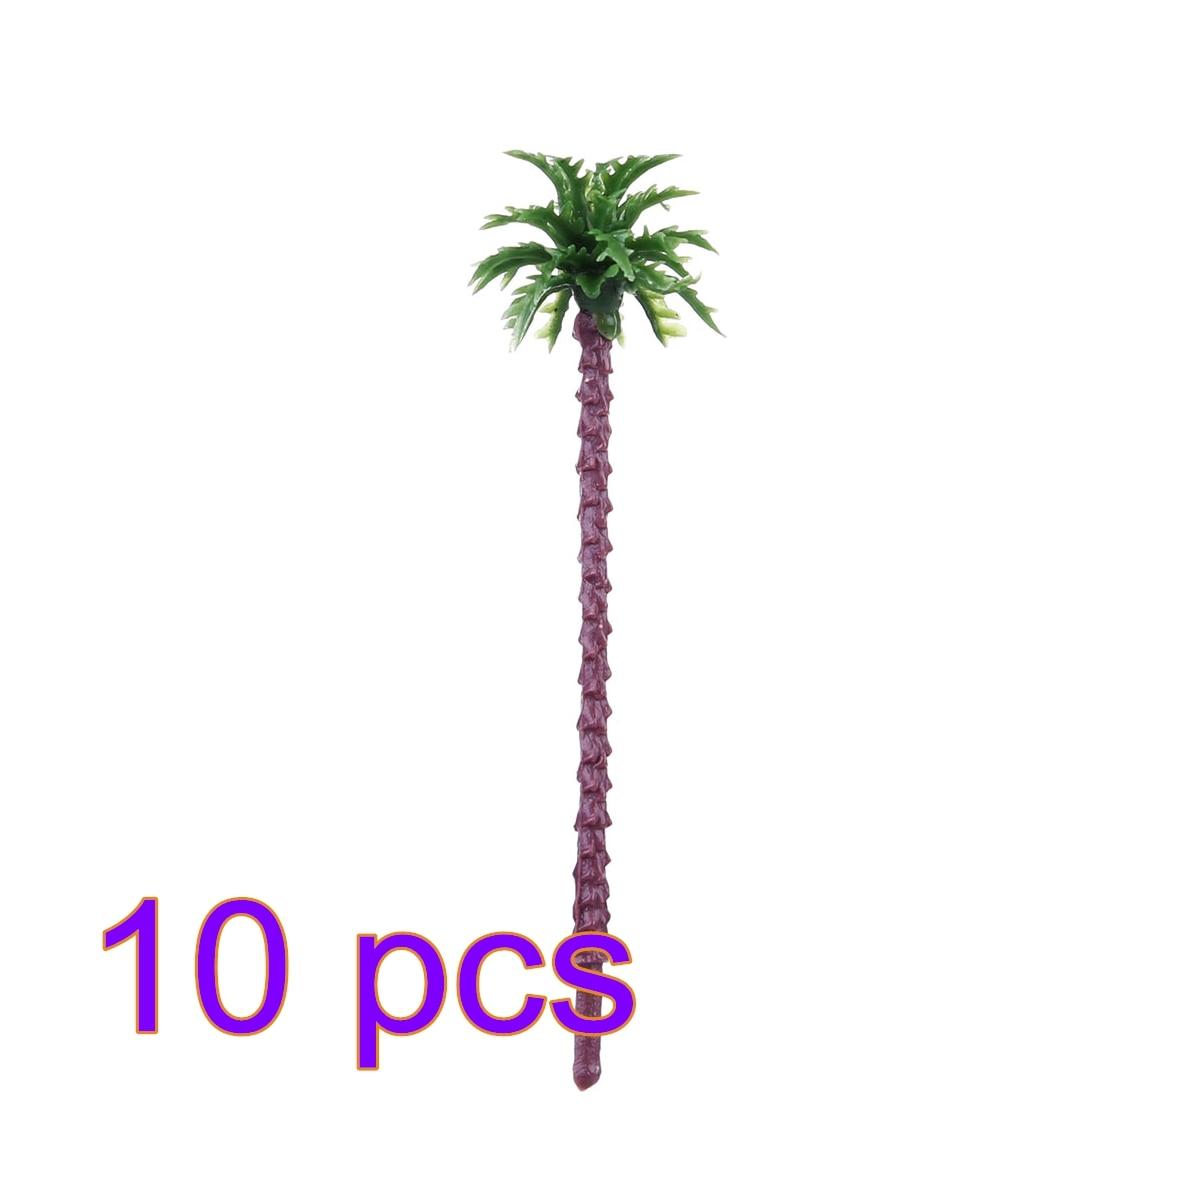 10 Pcs 5.5cm Plastic Coconut Palm Tree Train Railroad Architecture Diorama Diy  Model Trees For Railroad Trains